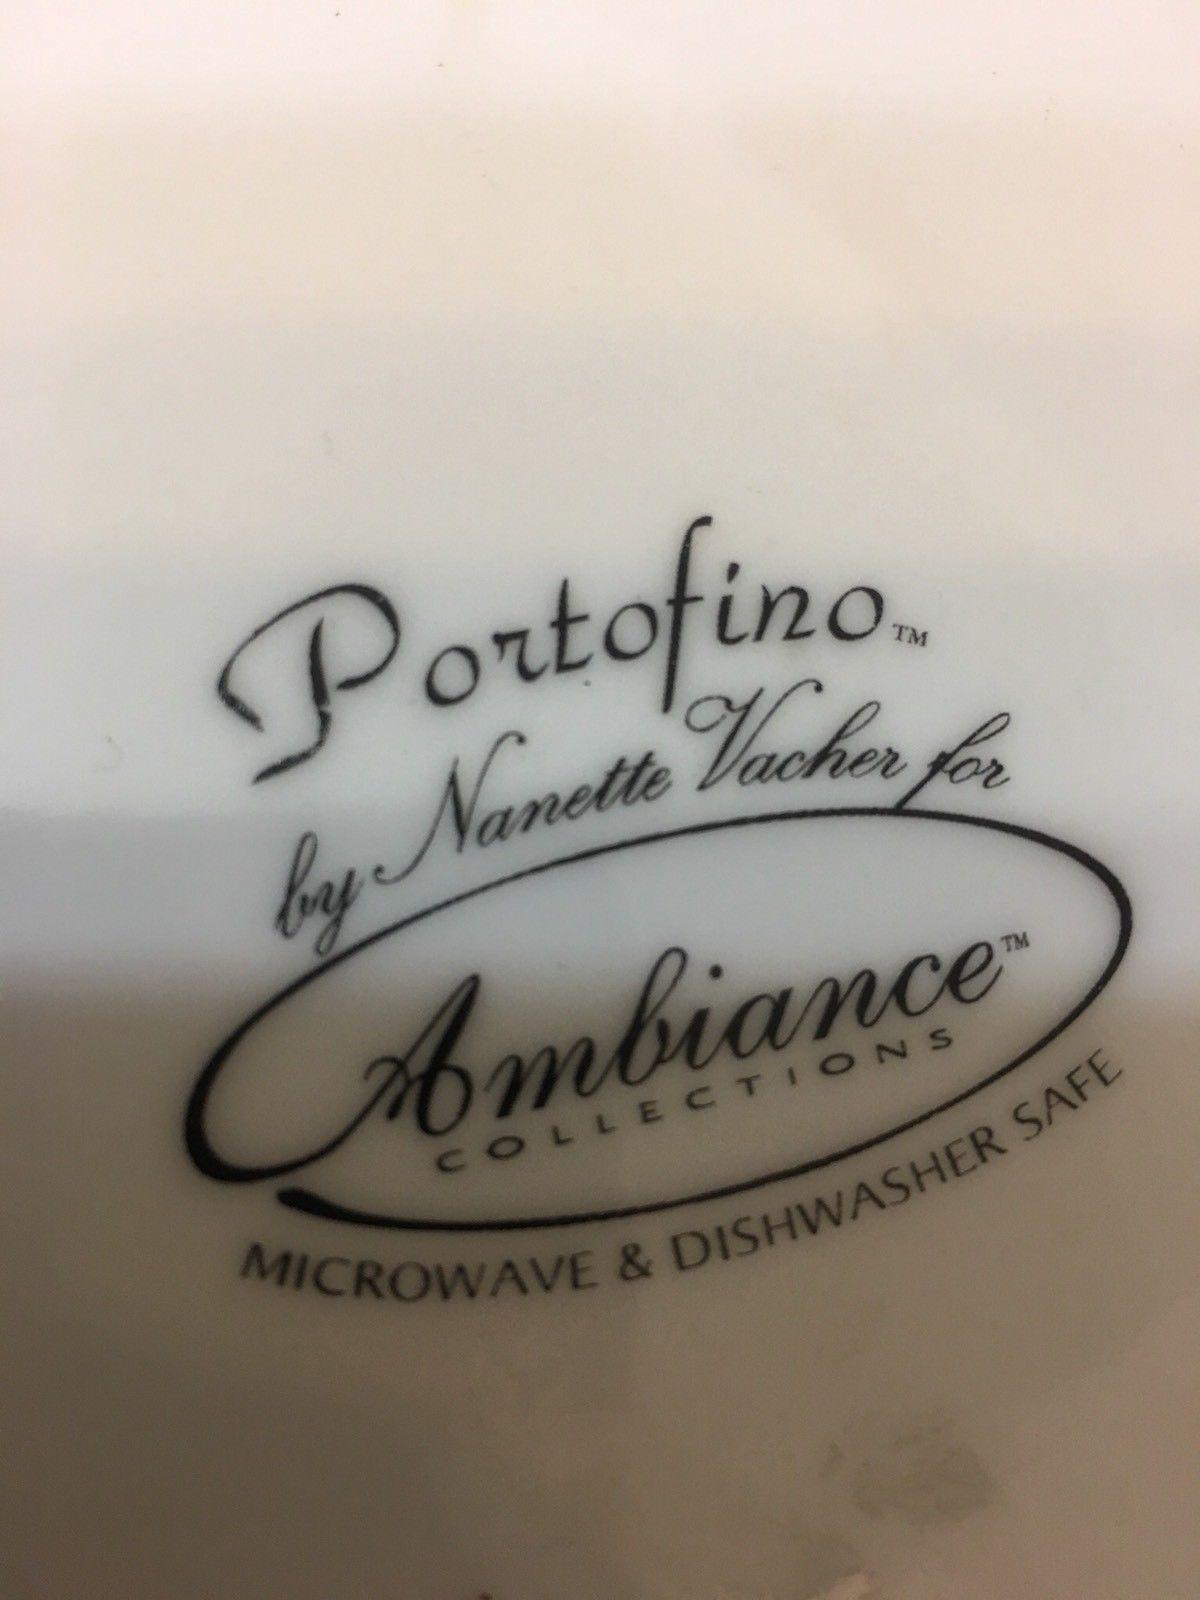 RARE large Nanette Vacher Ambiance Collection Portofino pitcher blue flowers